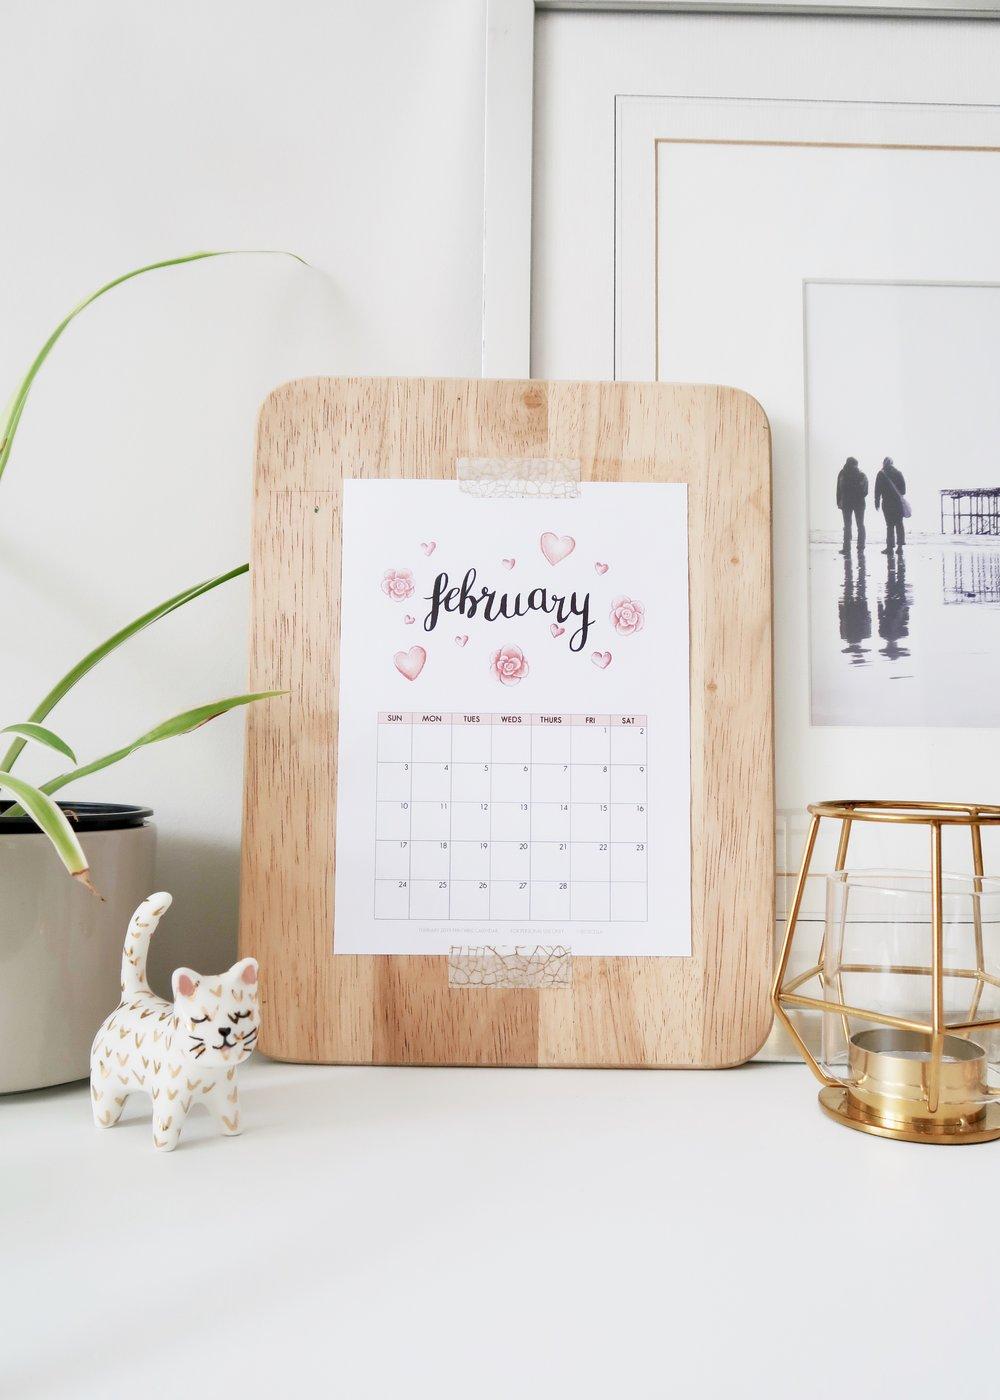 Illustrated February 2019 Calendar by Isoscella